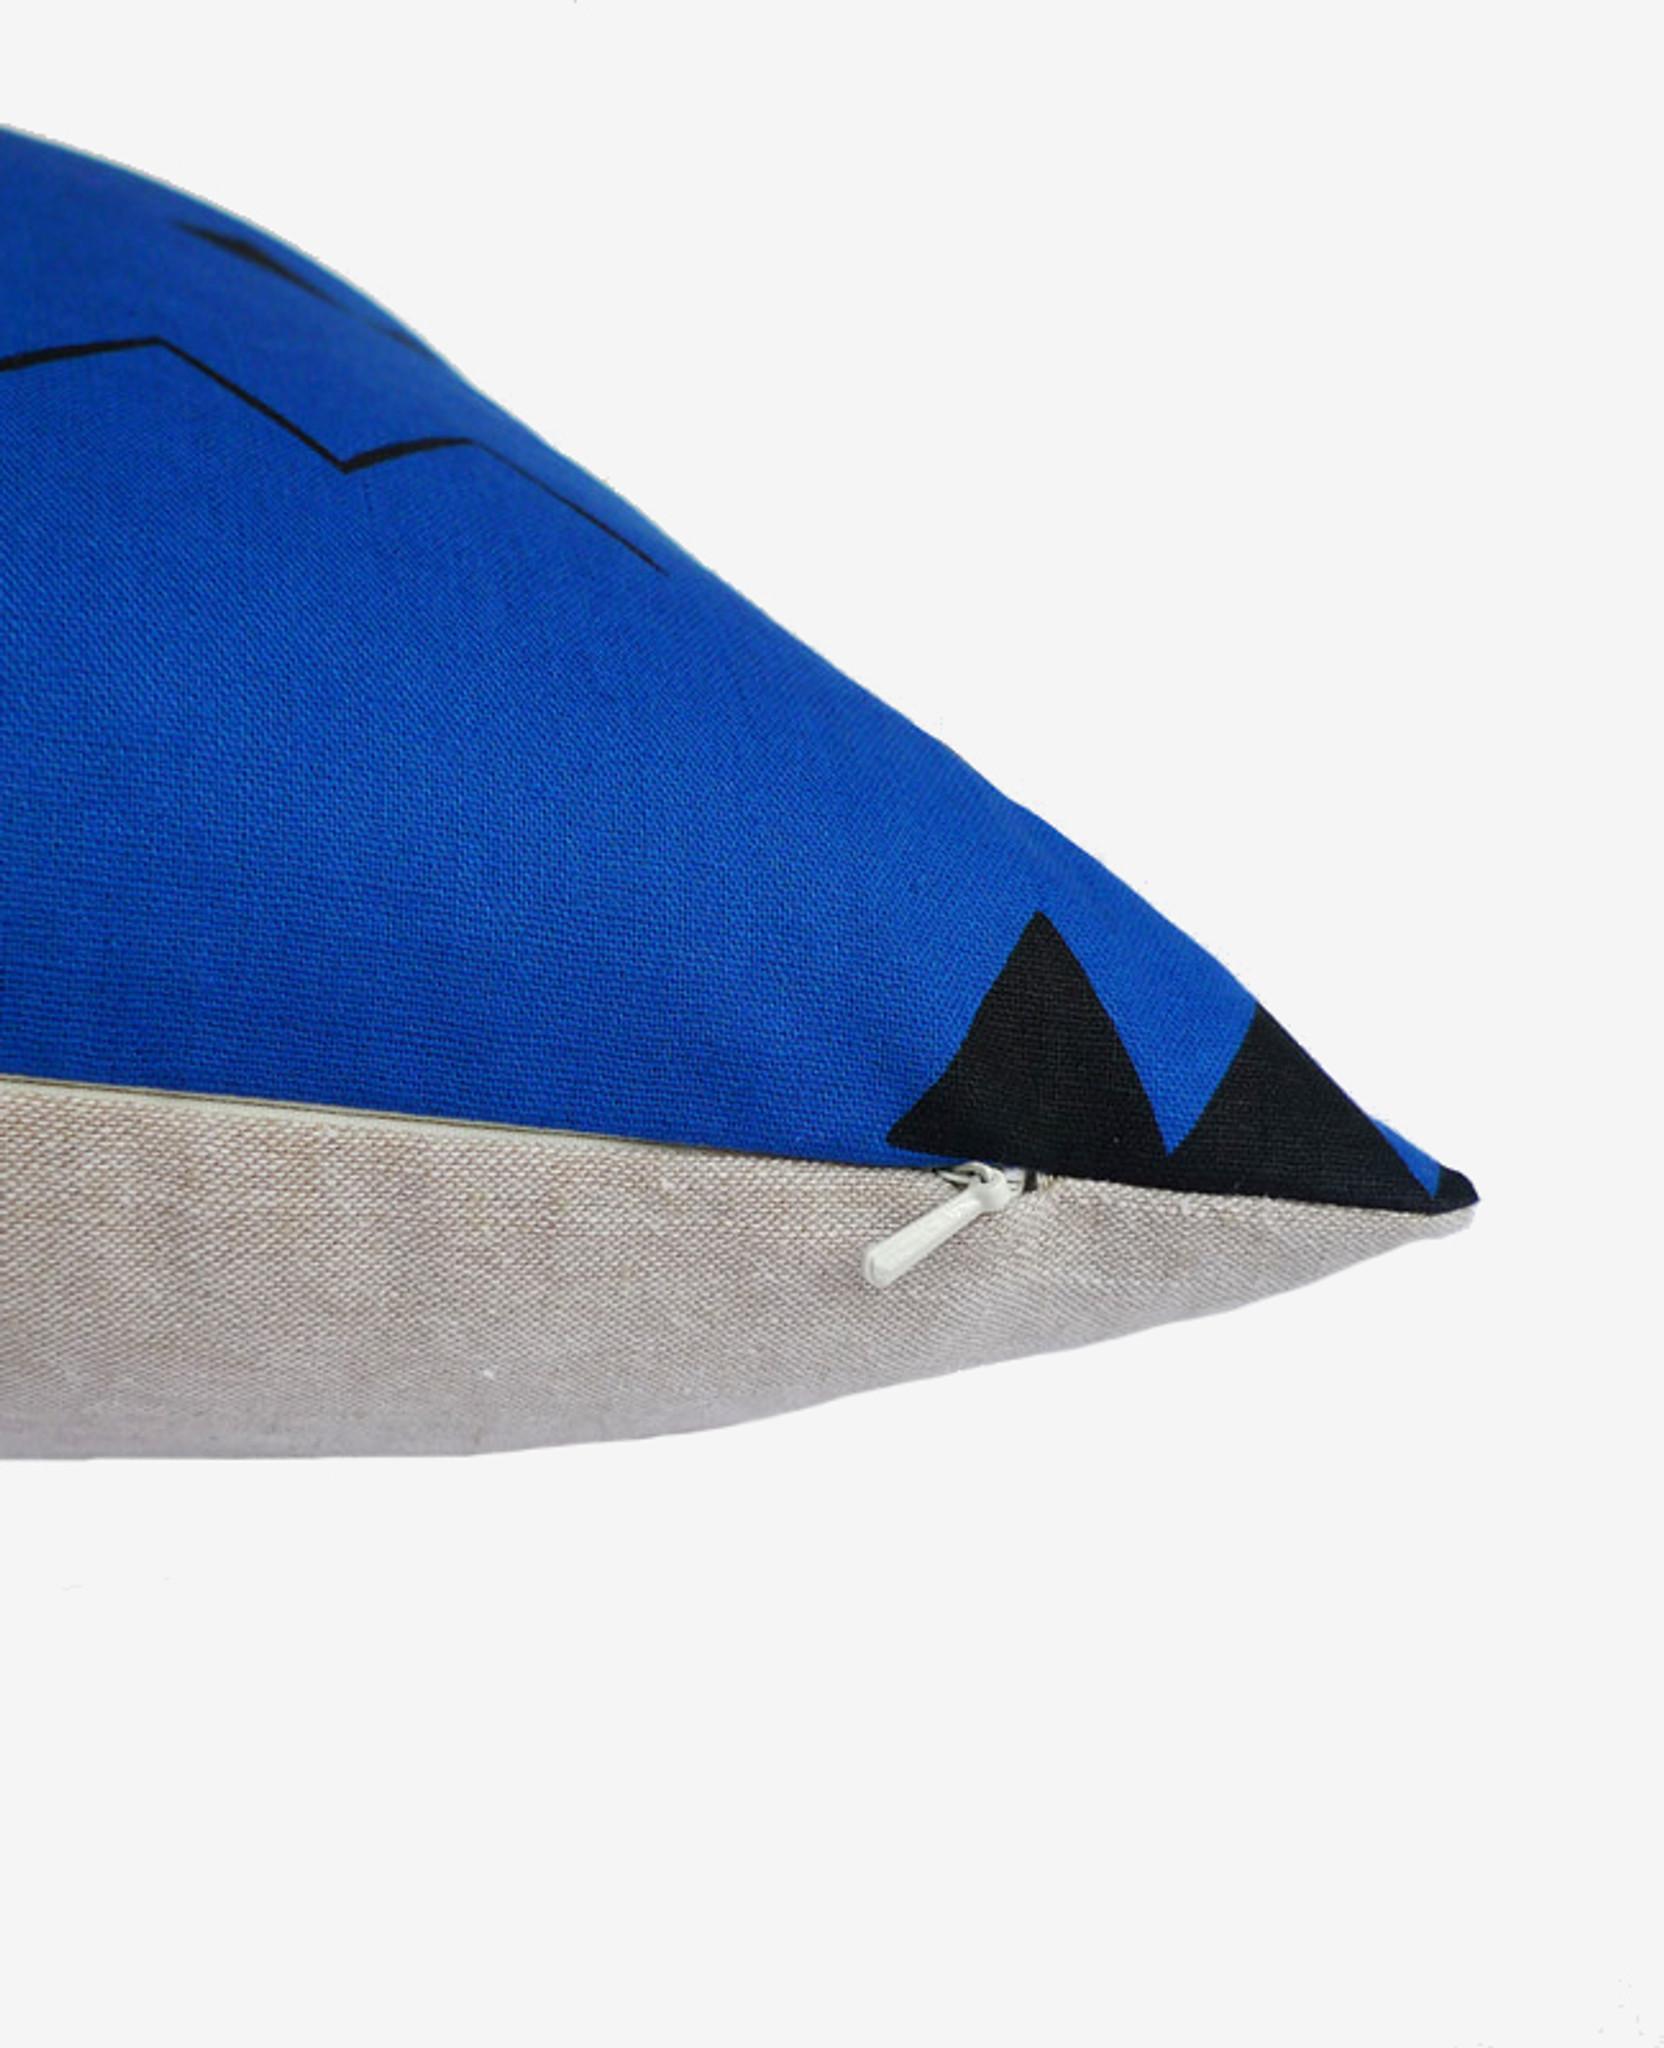 Indigo Blue Zig Zag Pillow